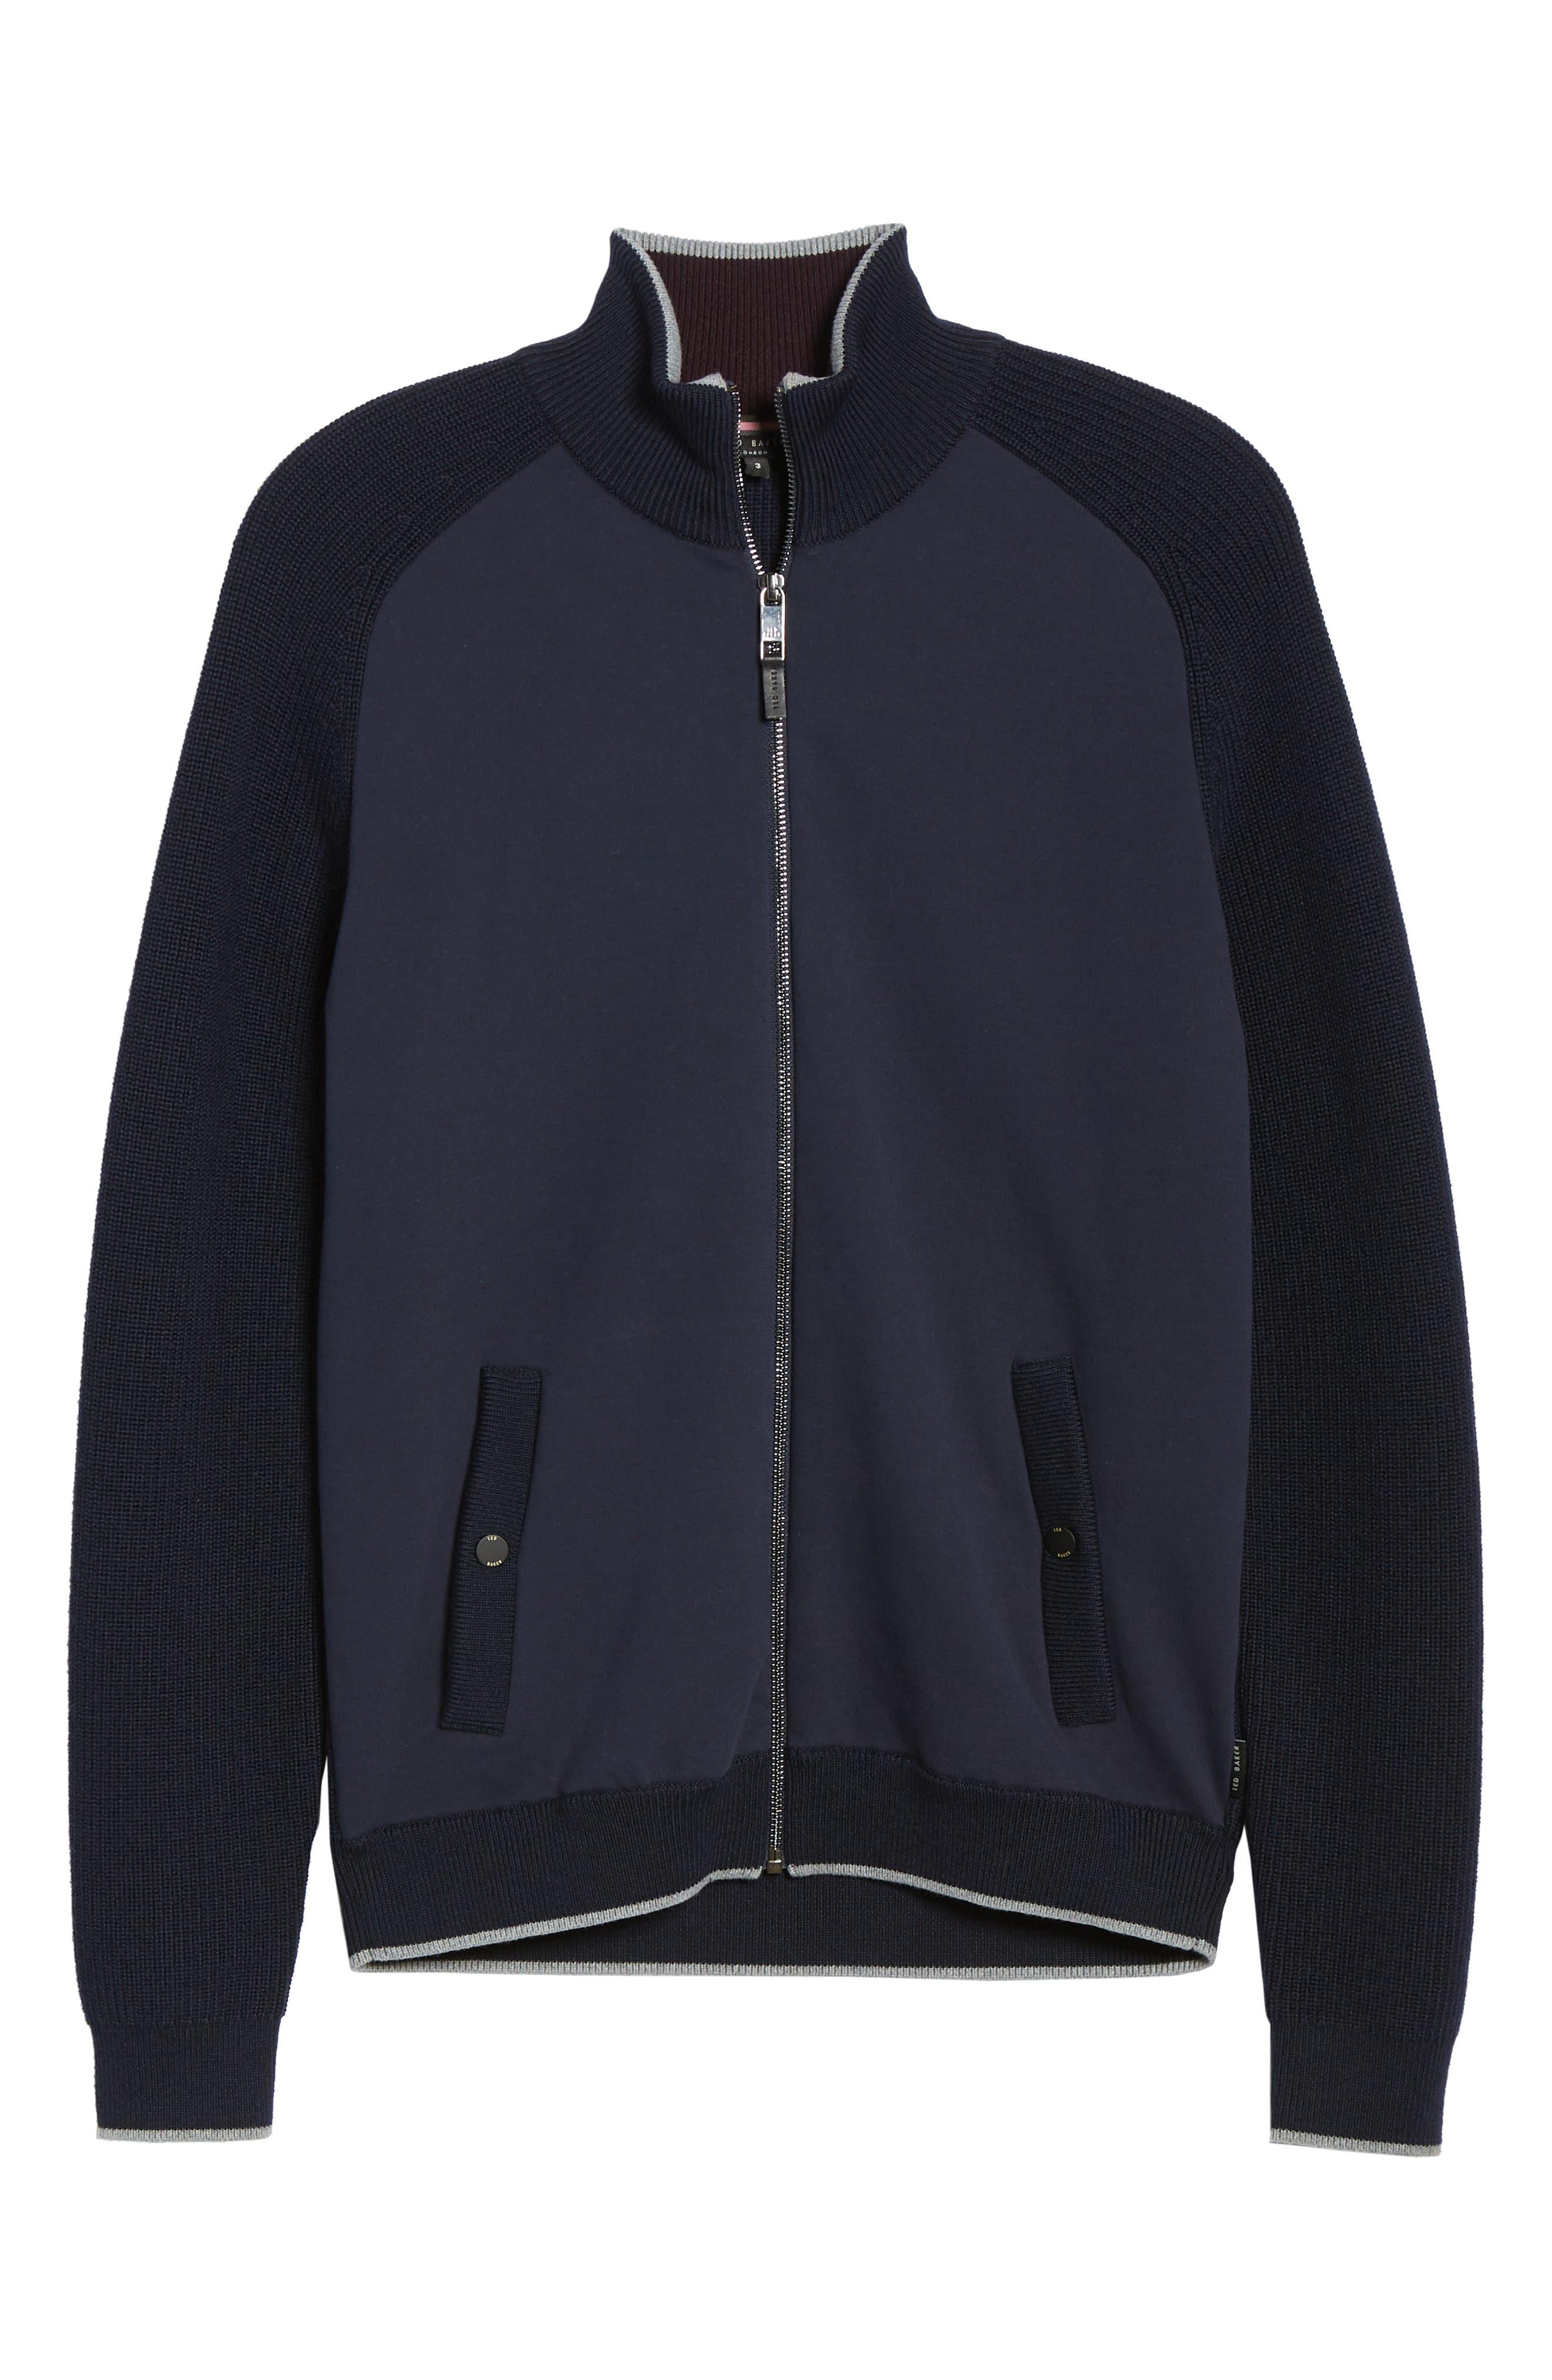 TED BAKER LONDON,                             Patrik Slim Fit Wool Zip Sweater,                             Alternate thumbnail 6, color,                             NAVY